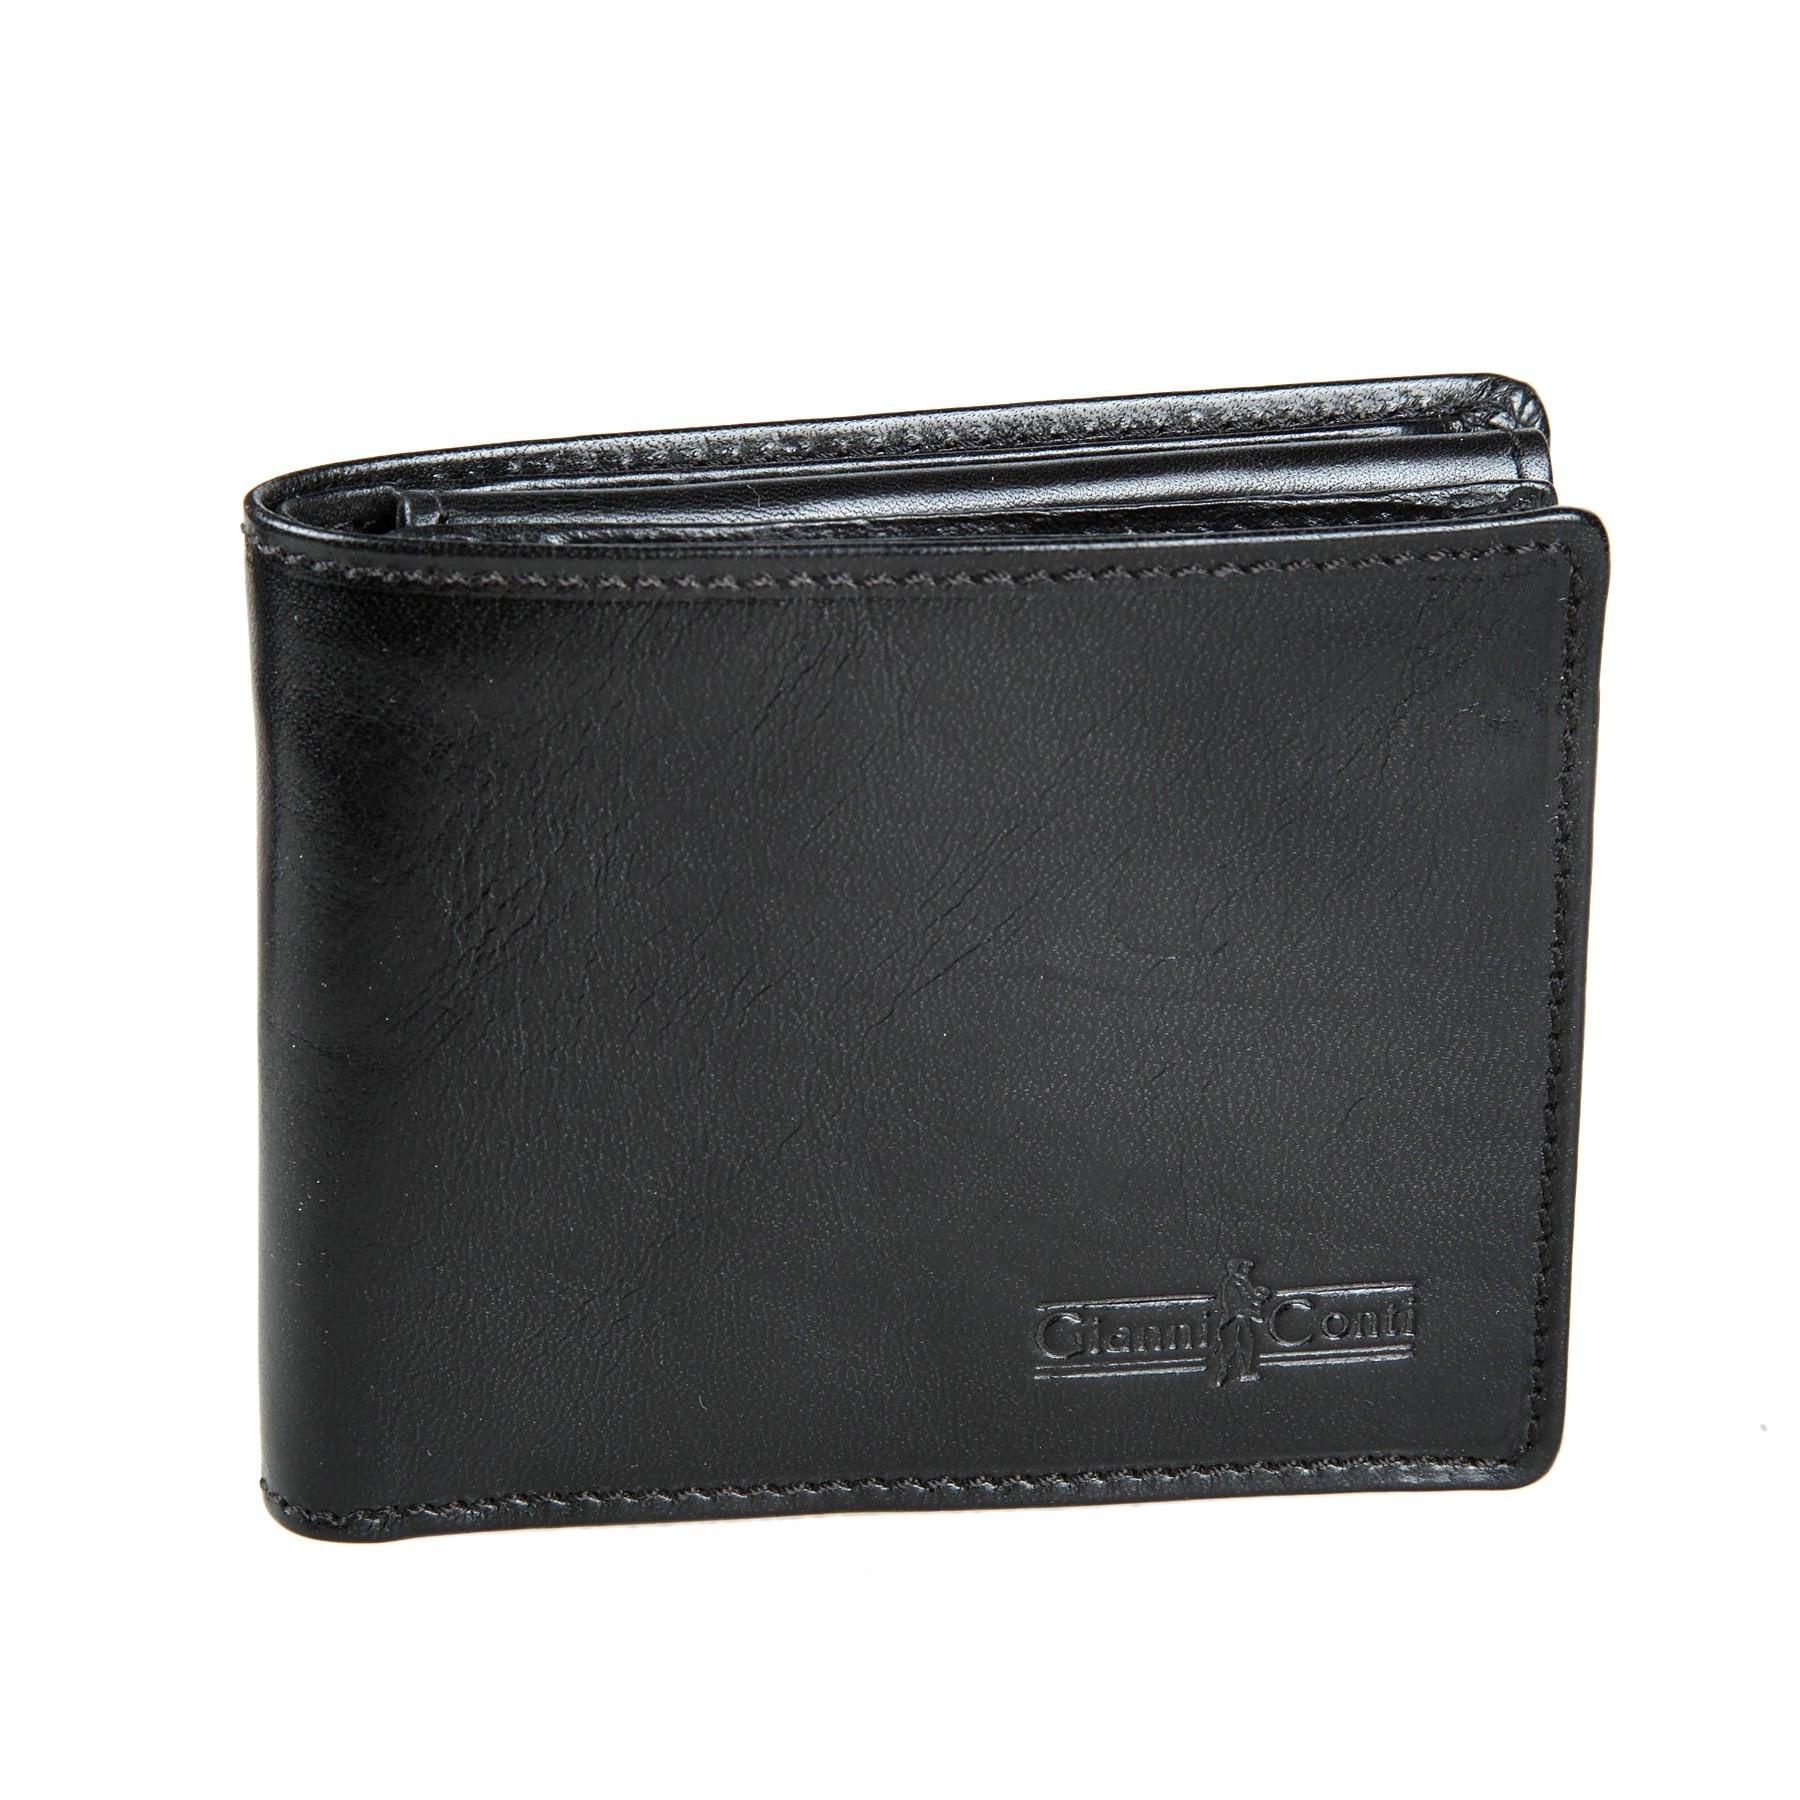 цена на Coin Purse Gianni Conti 907018 black